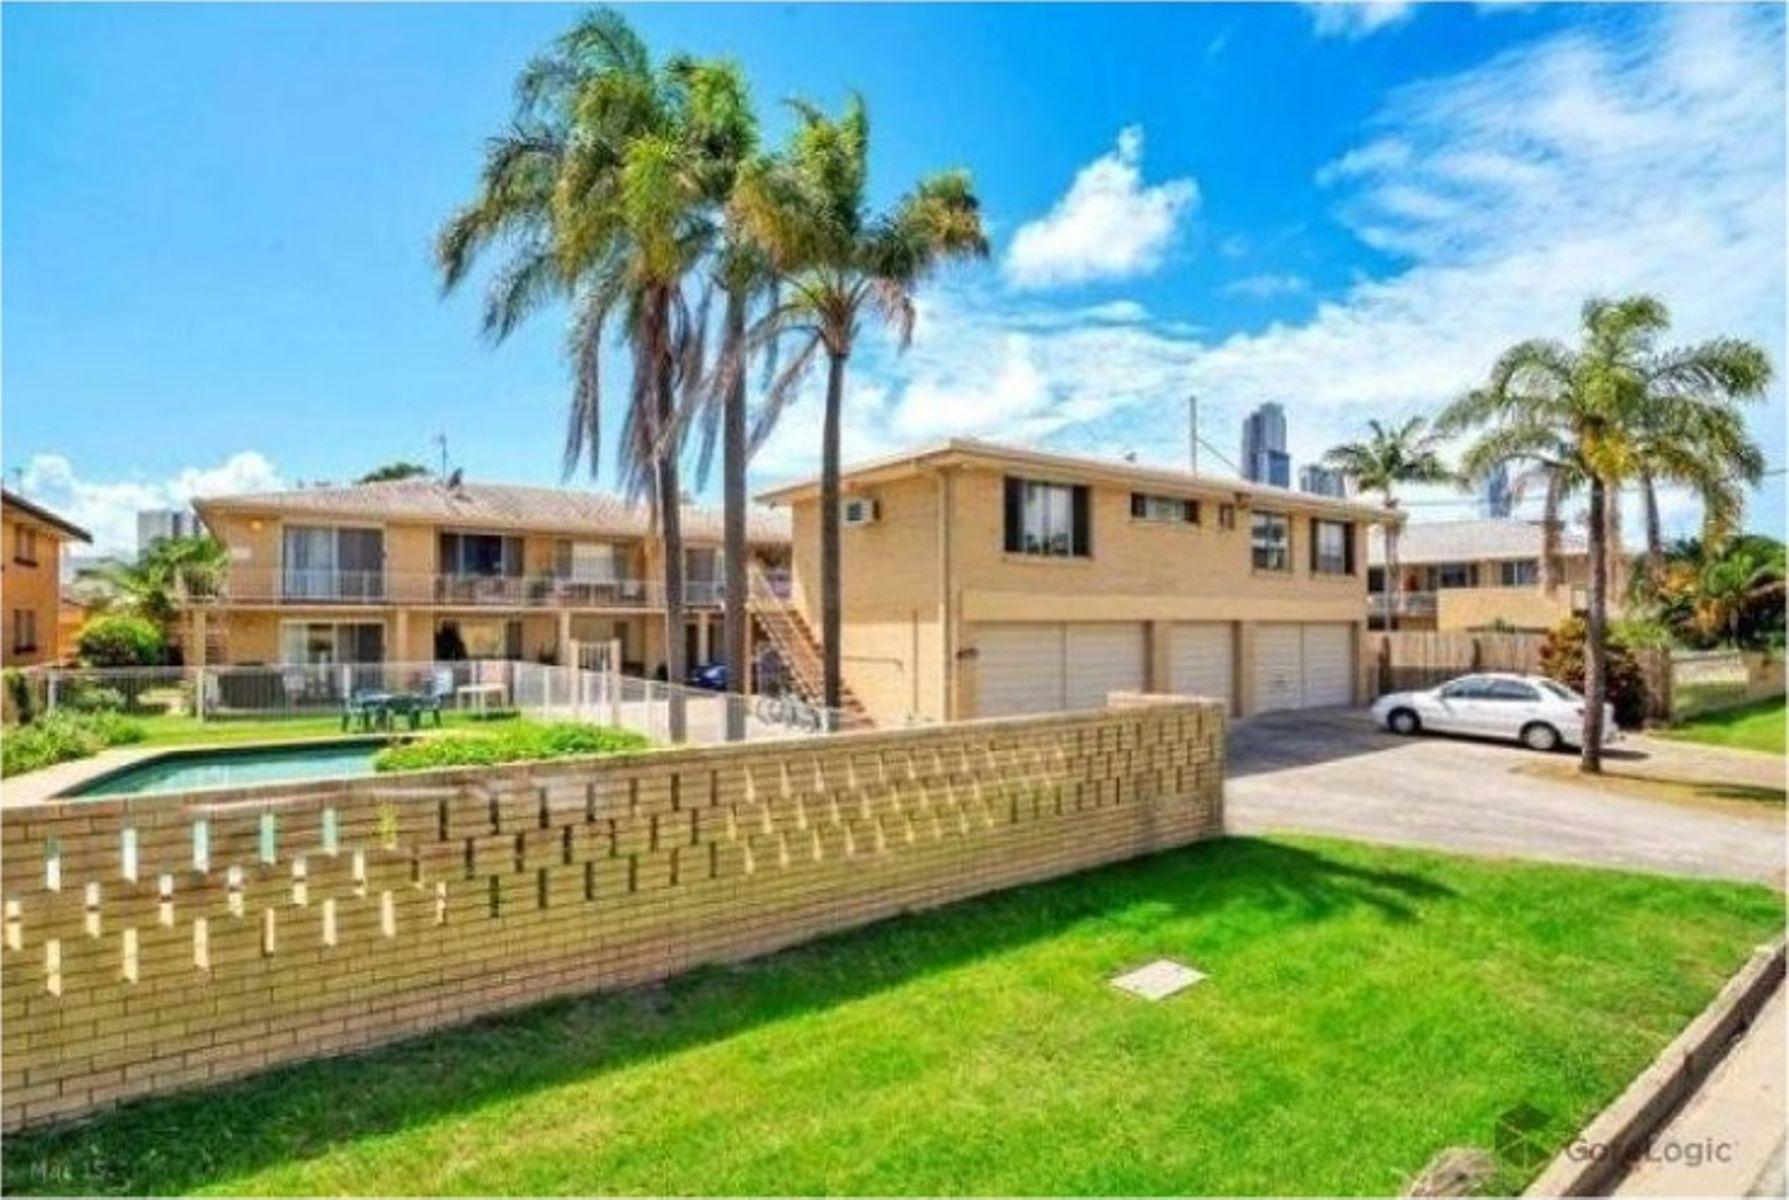 1/41 Burra Street, Surfers Paradise, QLD 4217